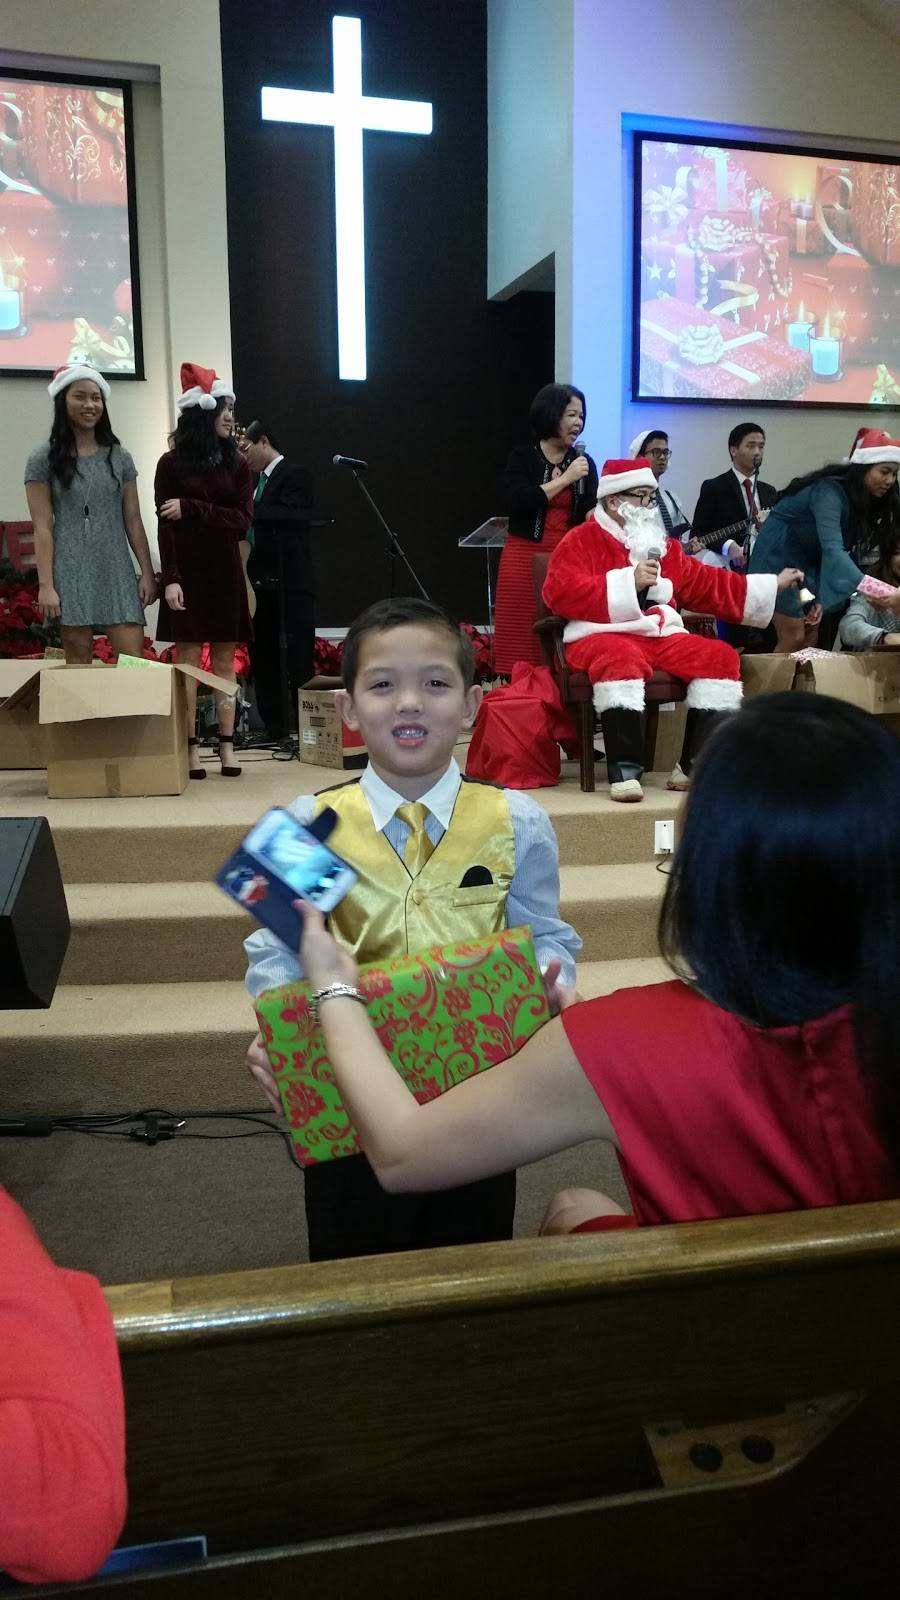 Vietnamese Baptist Church of Arlington - church  | Photo 4 of 10 | Address: 4515 SW Green Oaks Blvd, Arlington, TX 76017, USA | Phone: (817) 478-7592